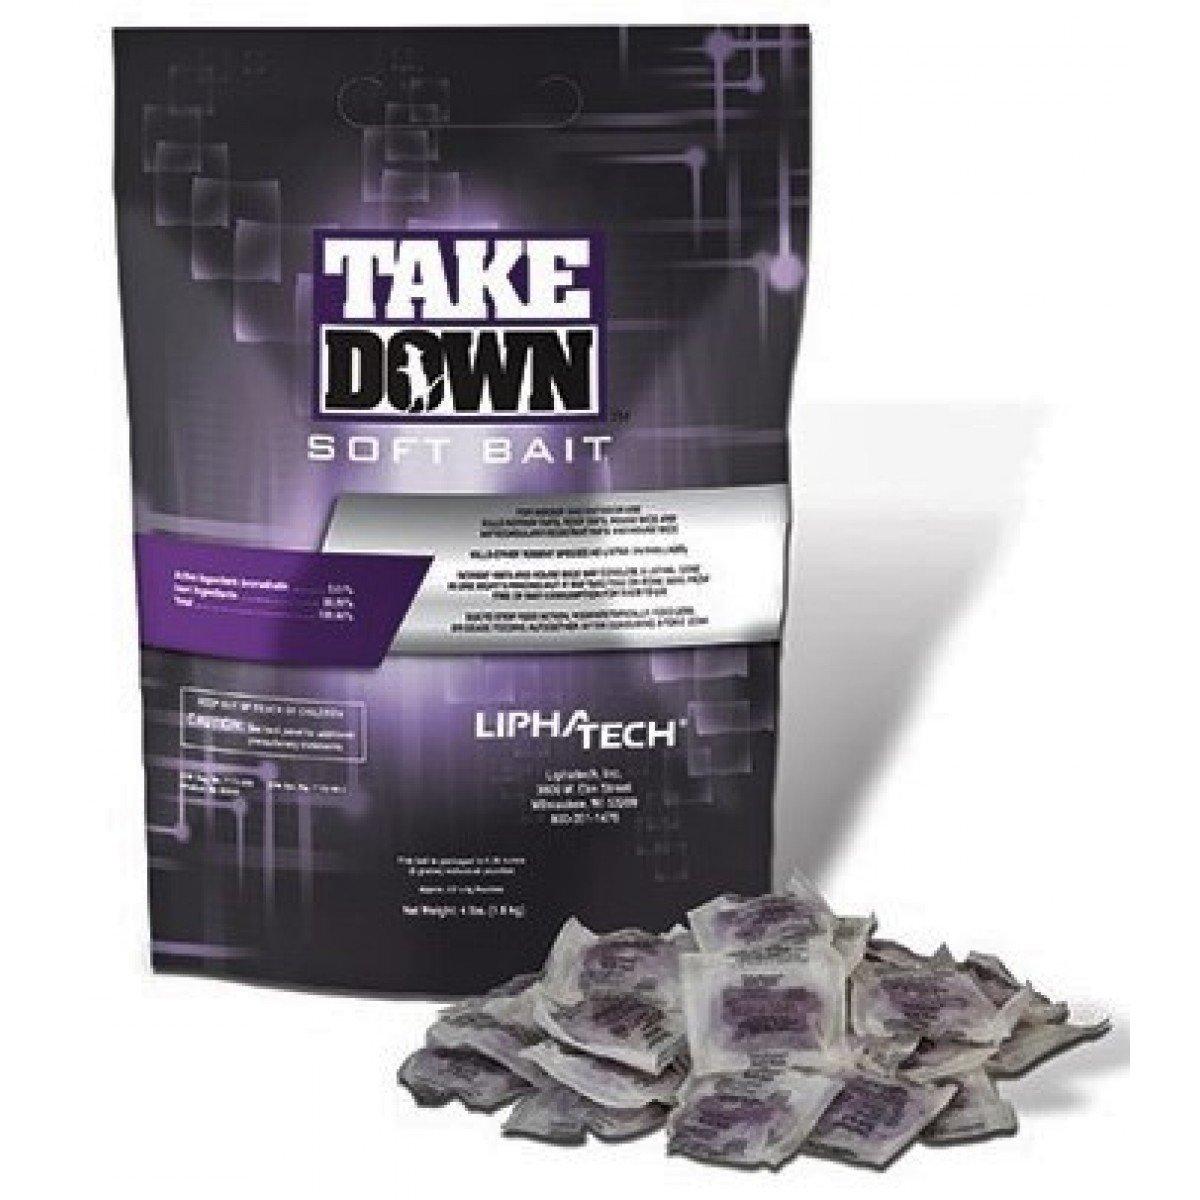 TakeDown Soft Bait Rodenticide 4 lb BAG by Lipha Tech